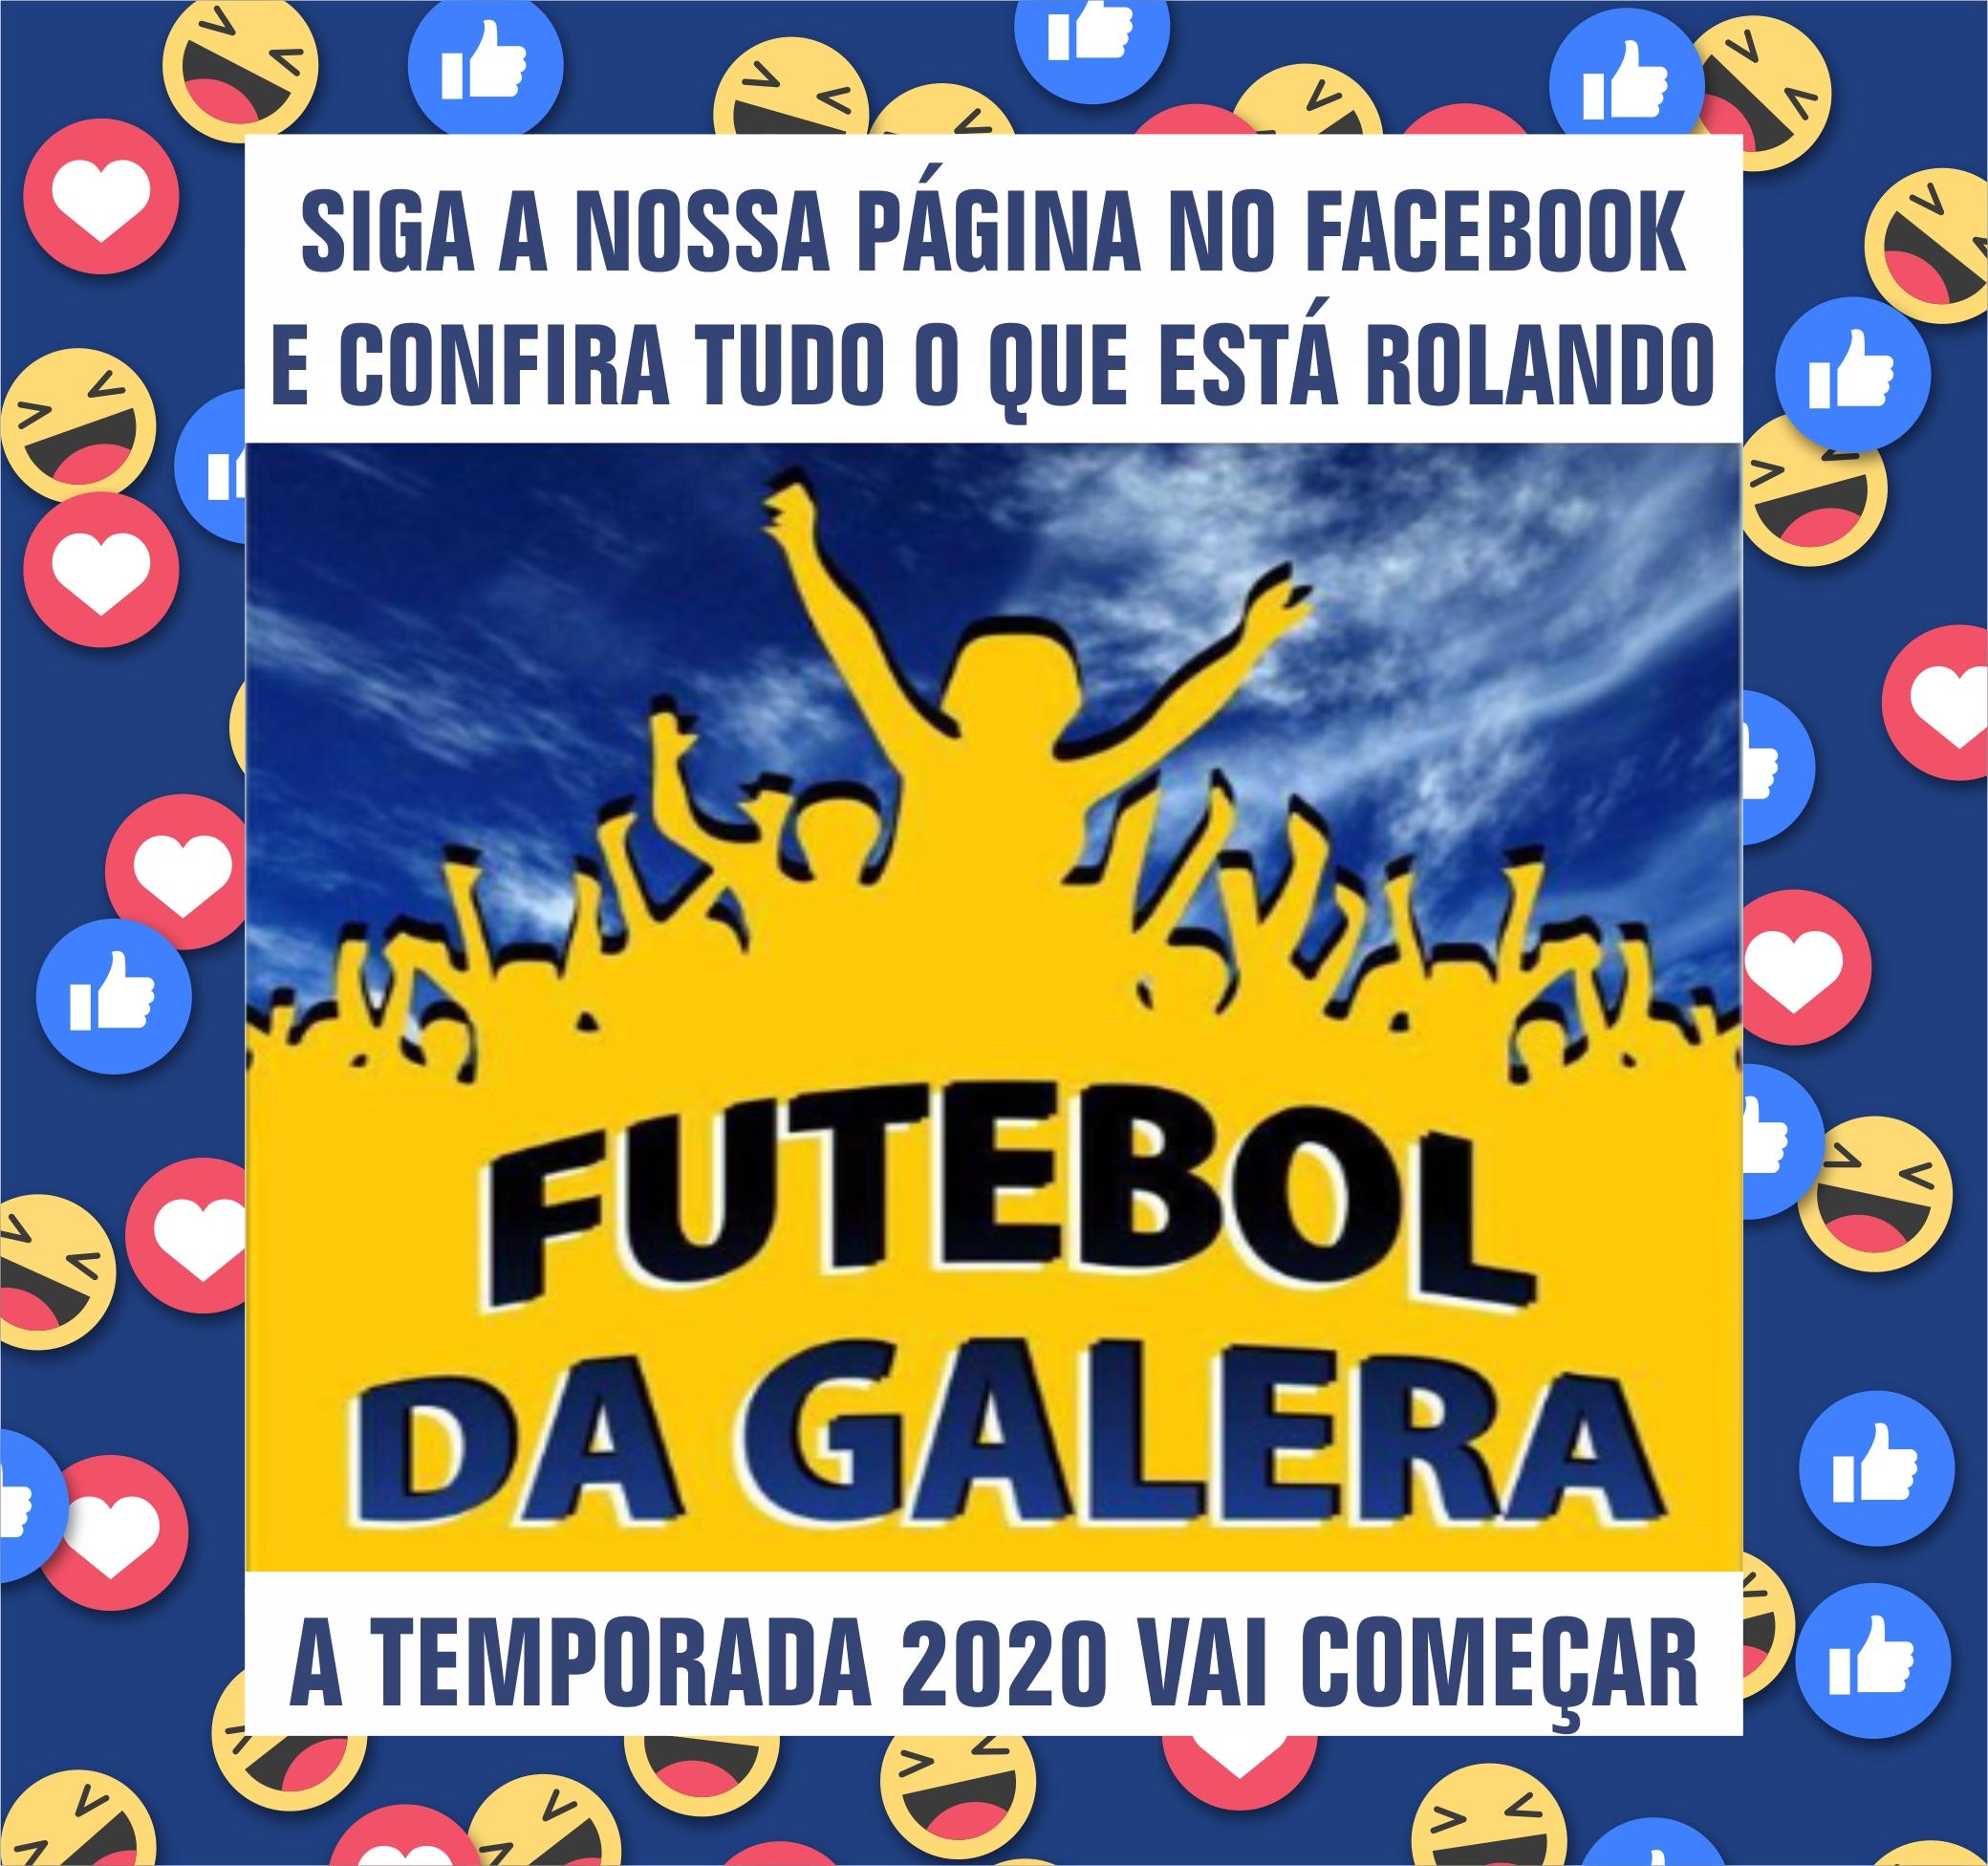 https://pt-br.facebook.com/futeboldagalera/